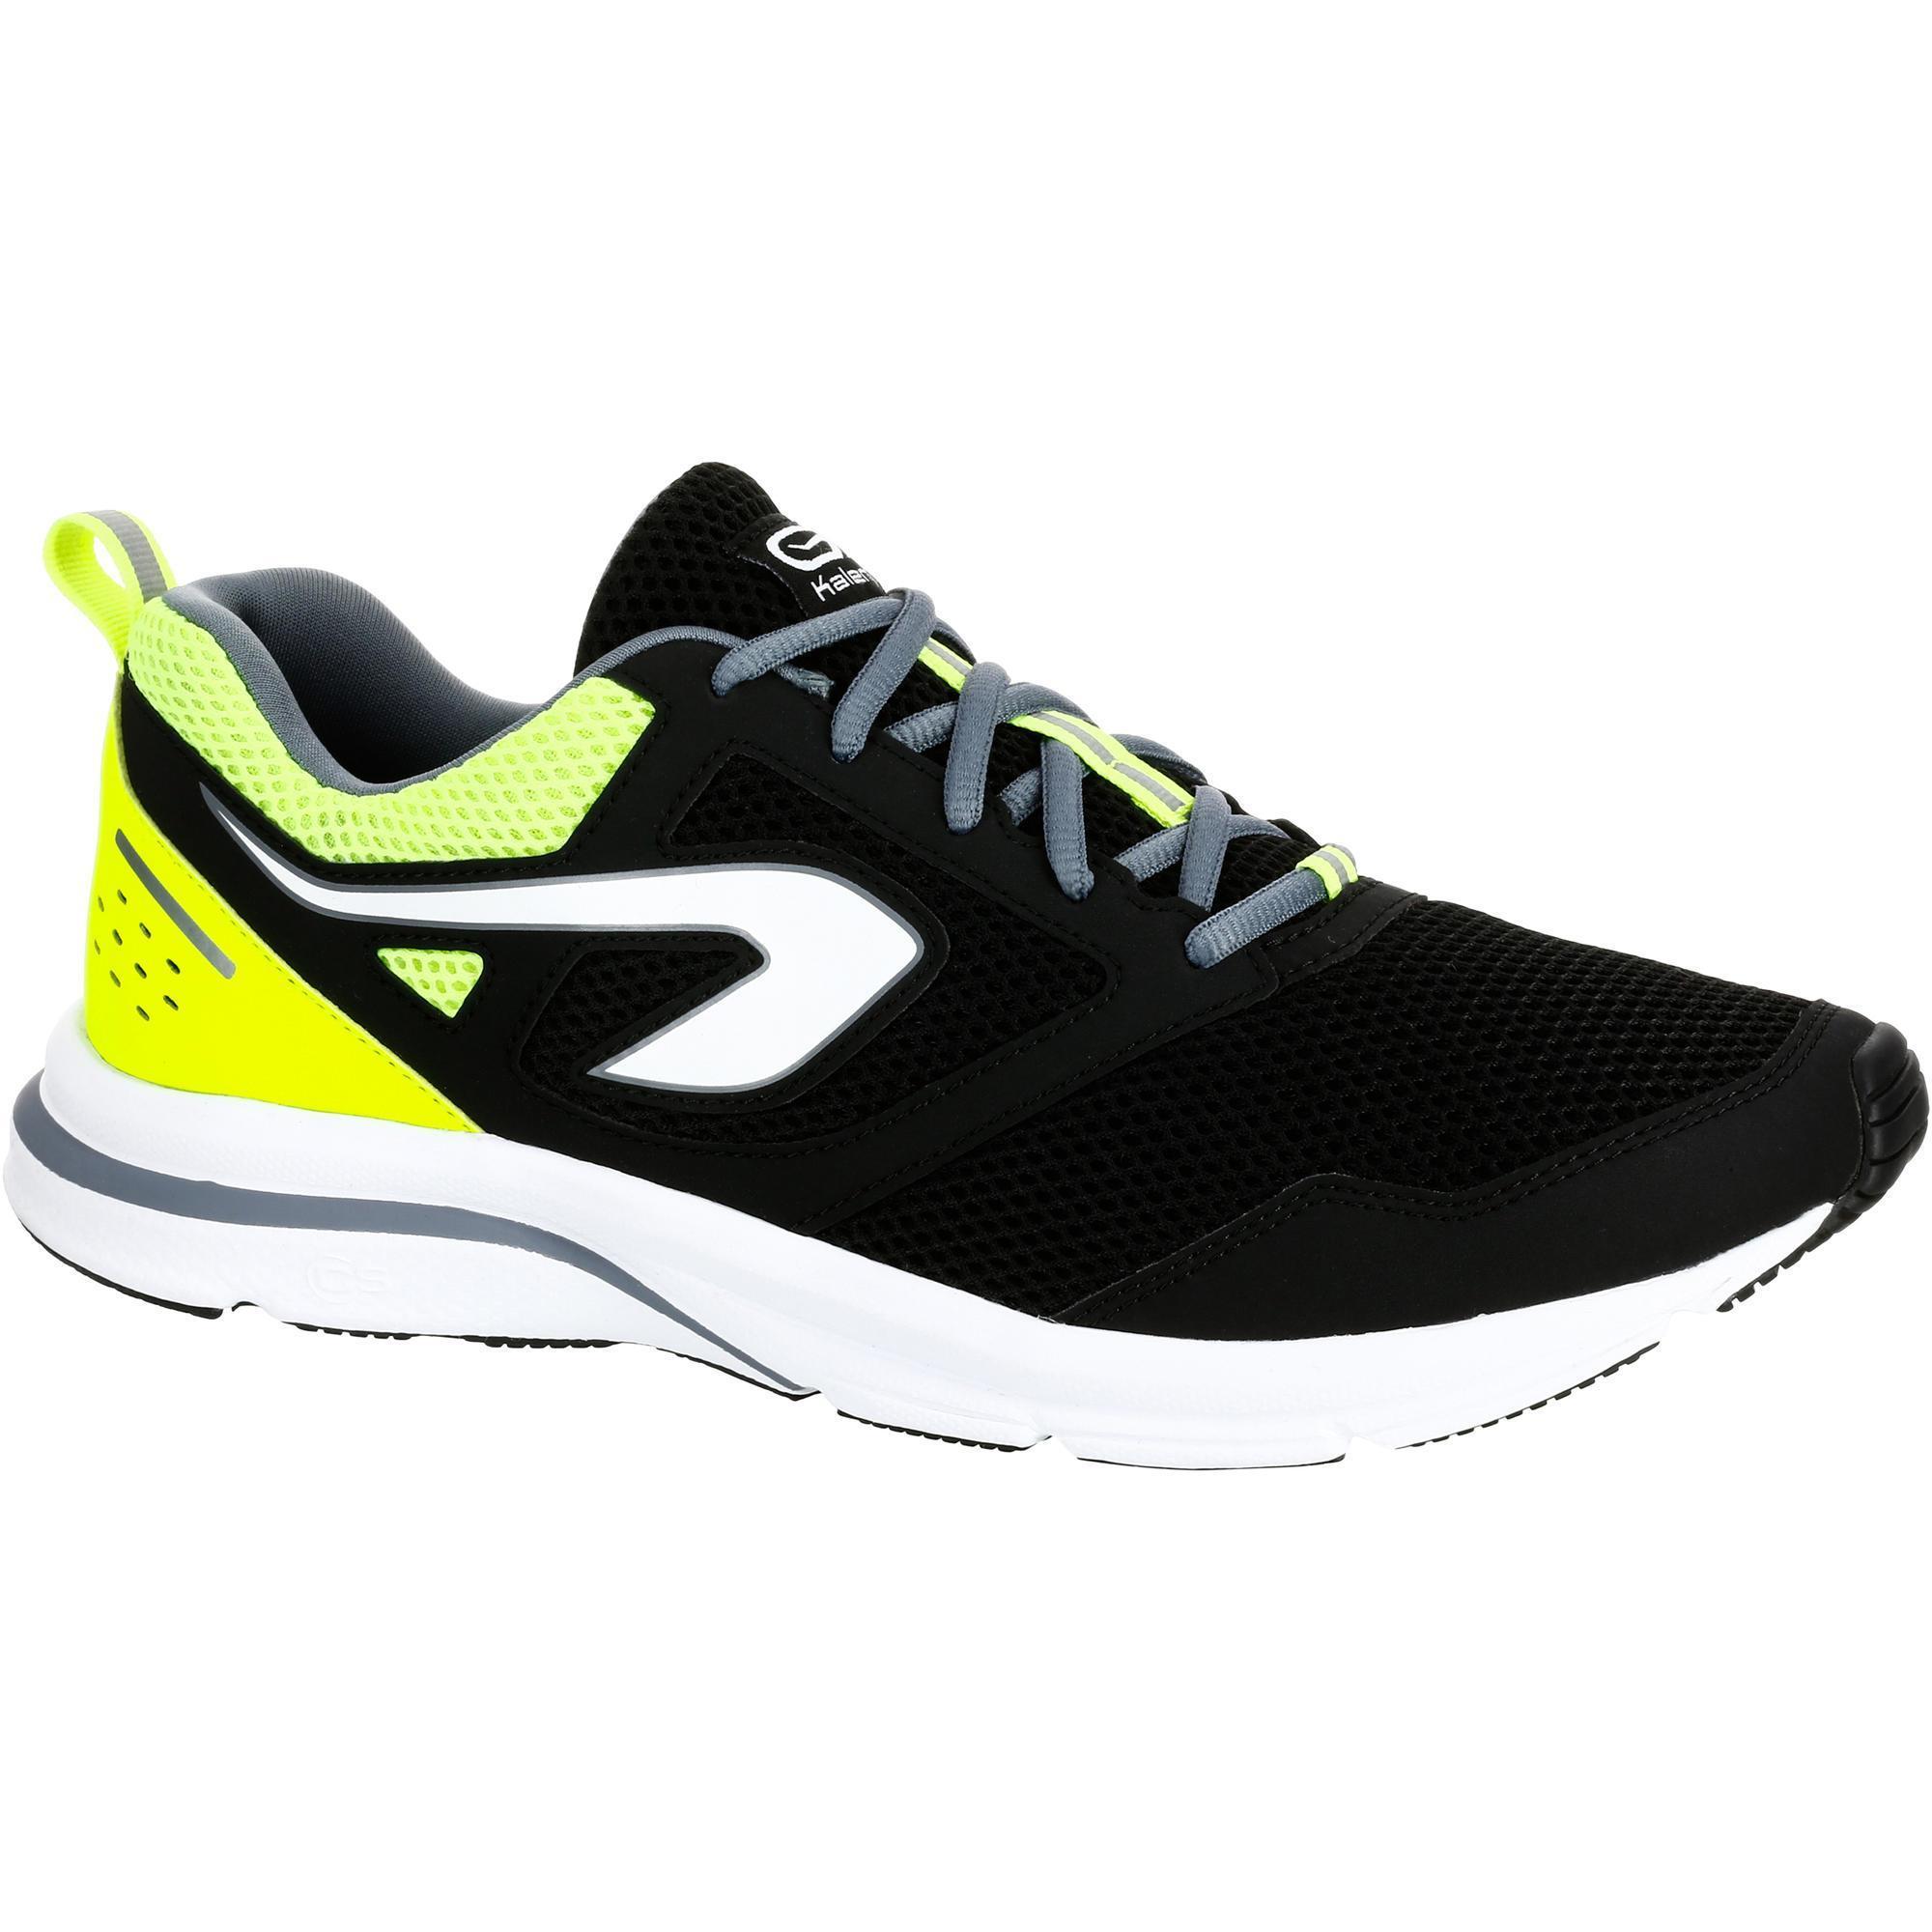 chaussure doigt de pied decathlon